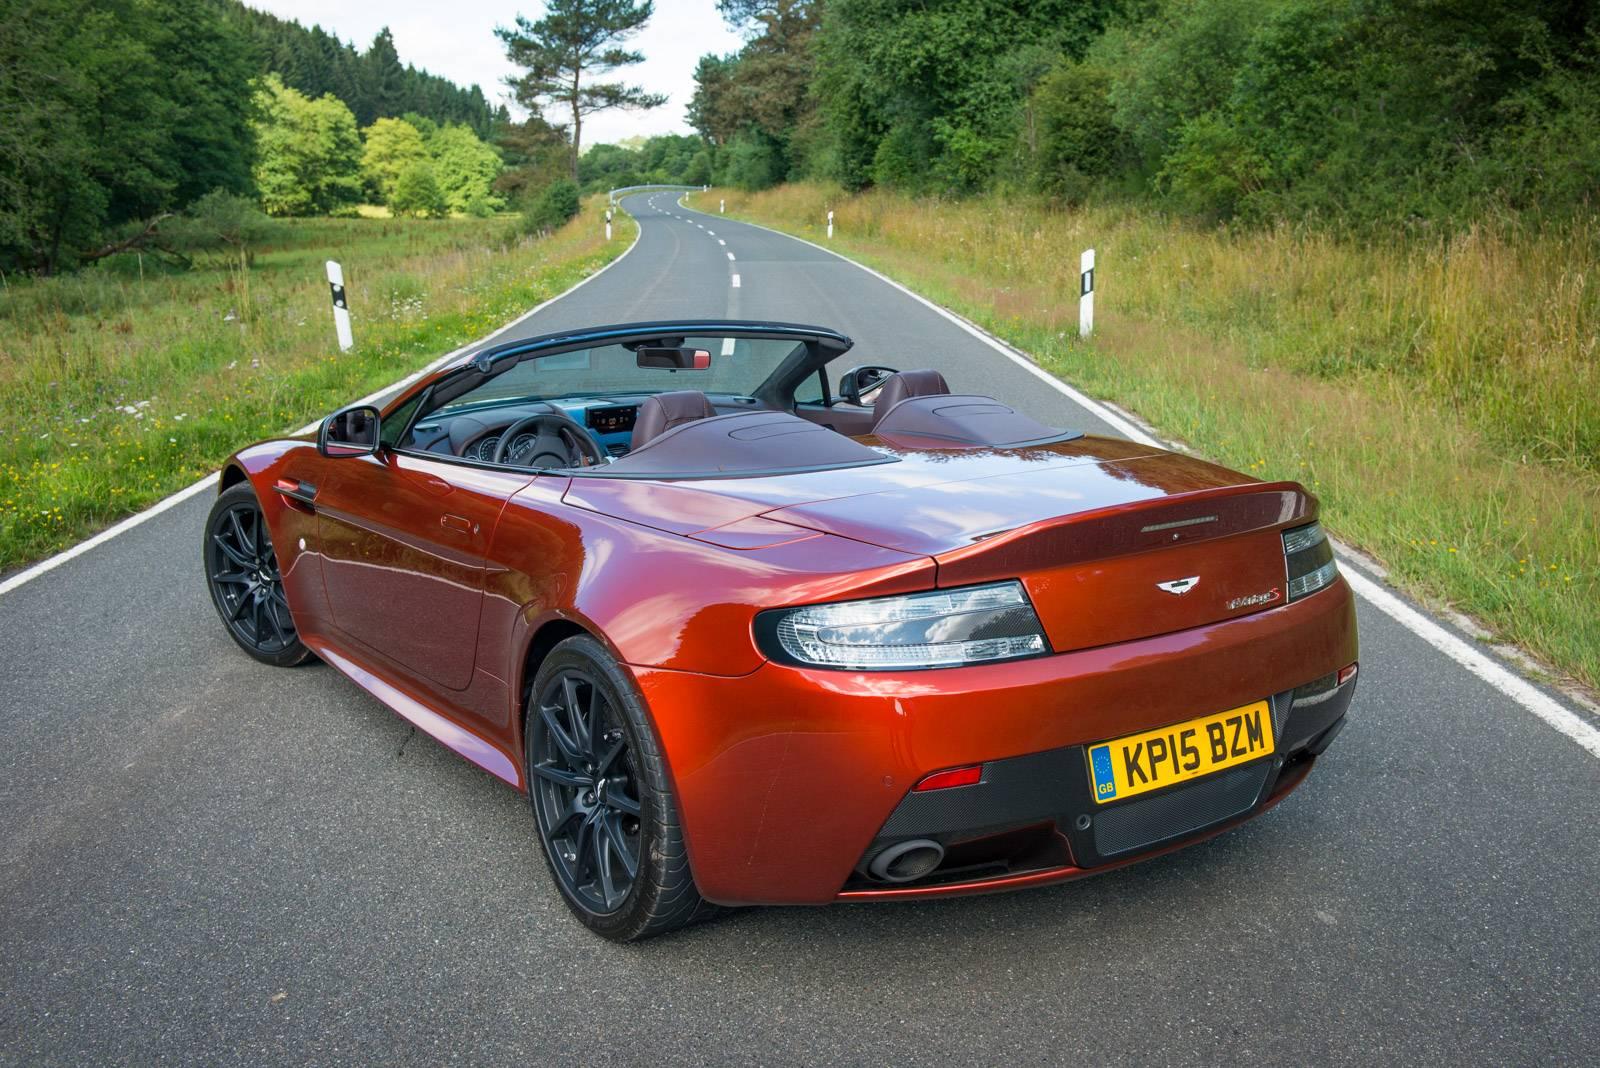 Aston Martin V Vantage S Roadster Review GTspirit - Aston martin vantage v12